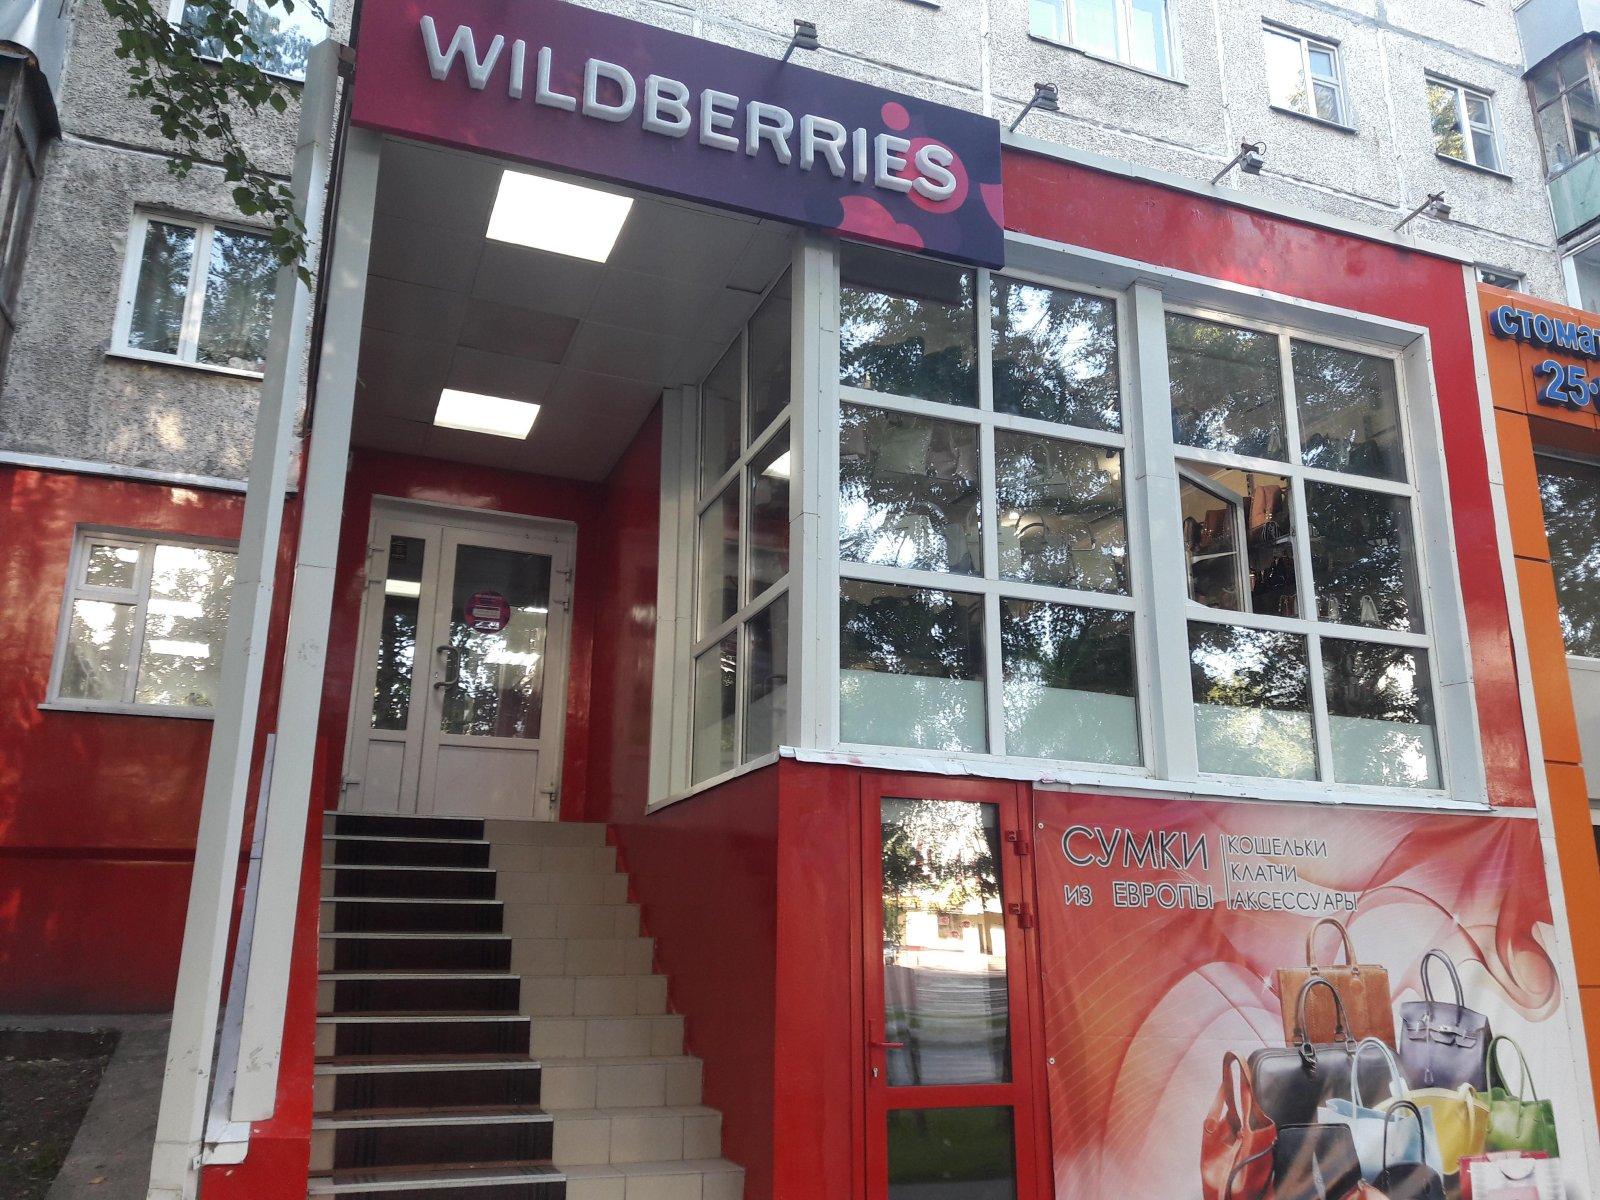 Валдбериес Интернет Магазин Воркута